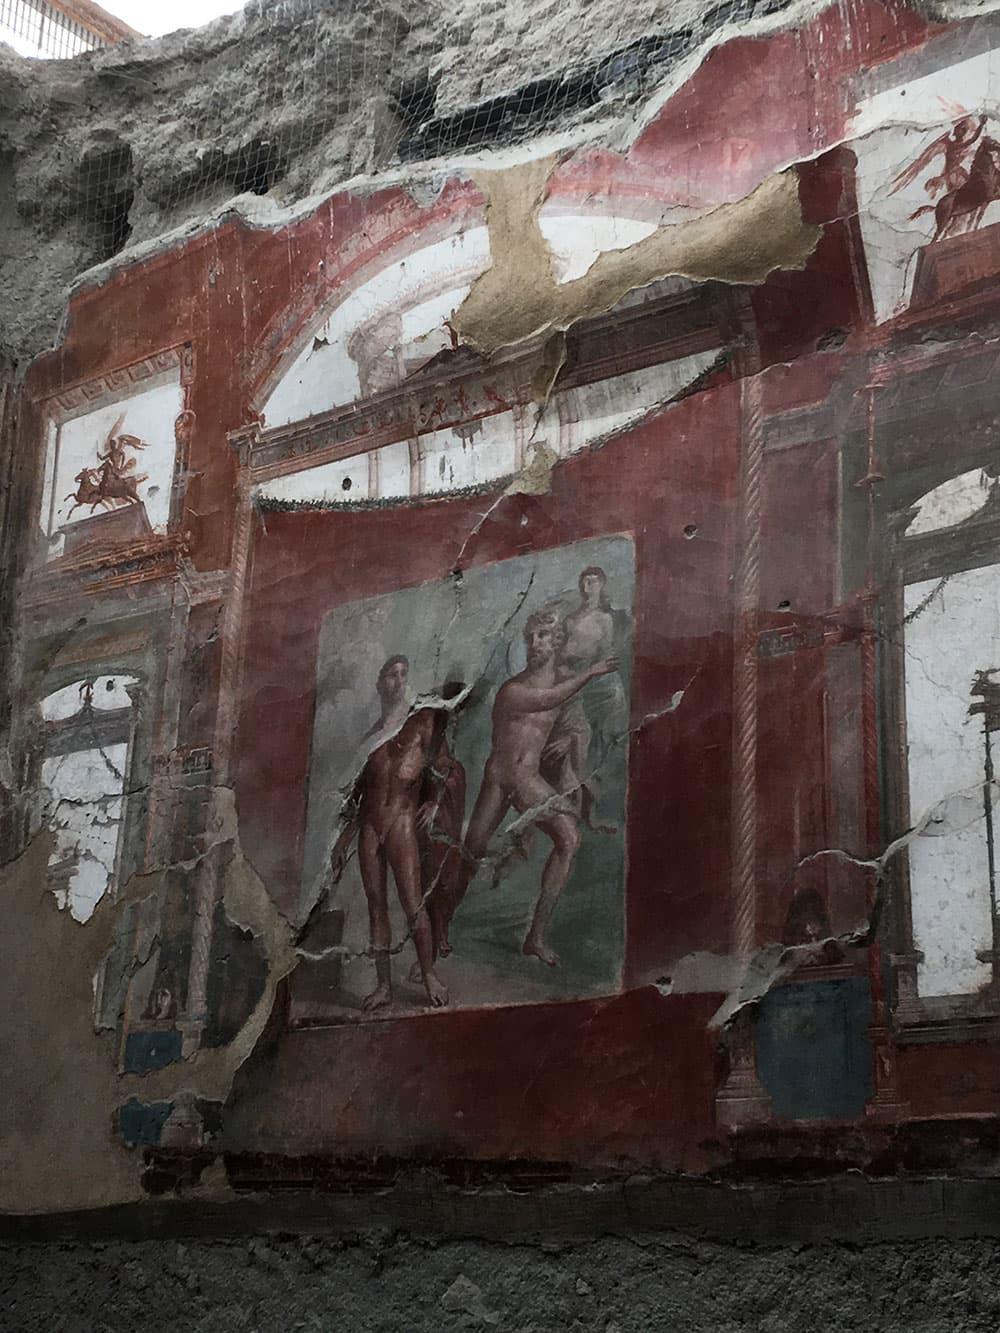 An ancient fresco at Herculaneum